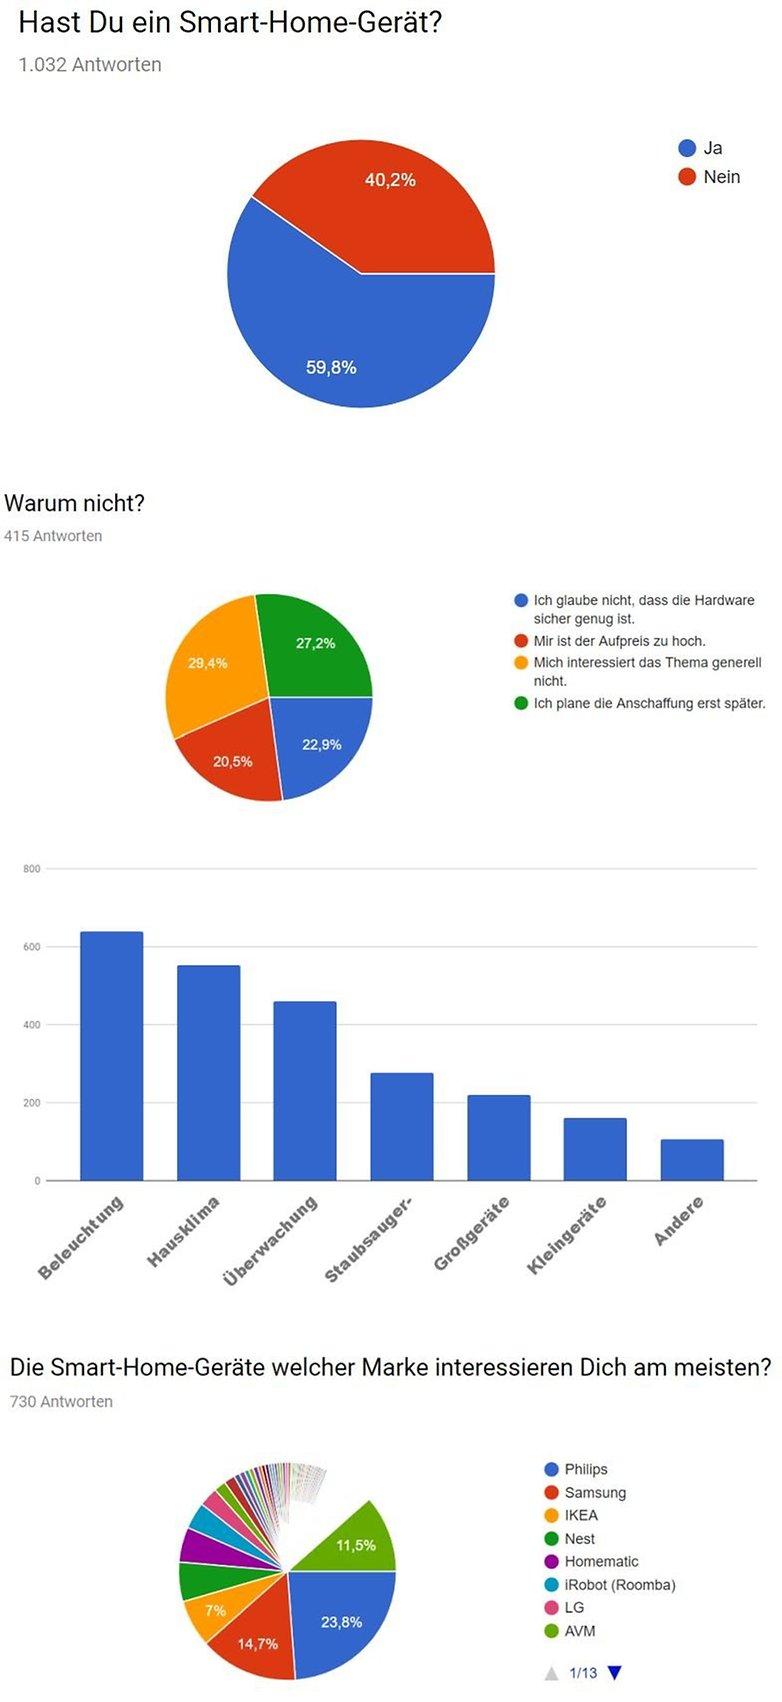 smart home survey response de